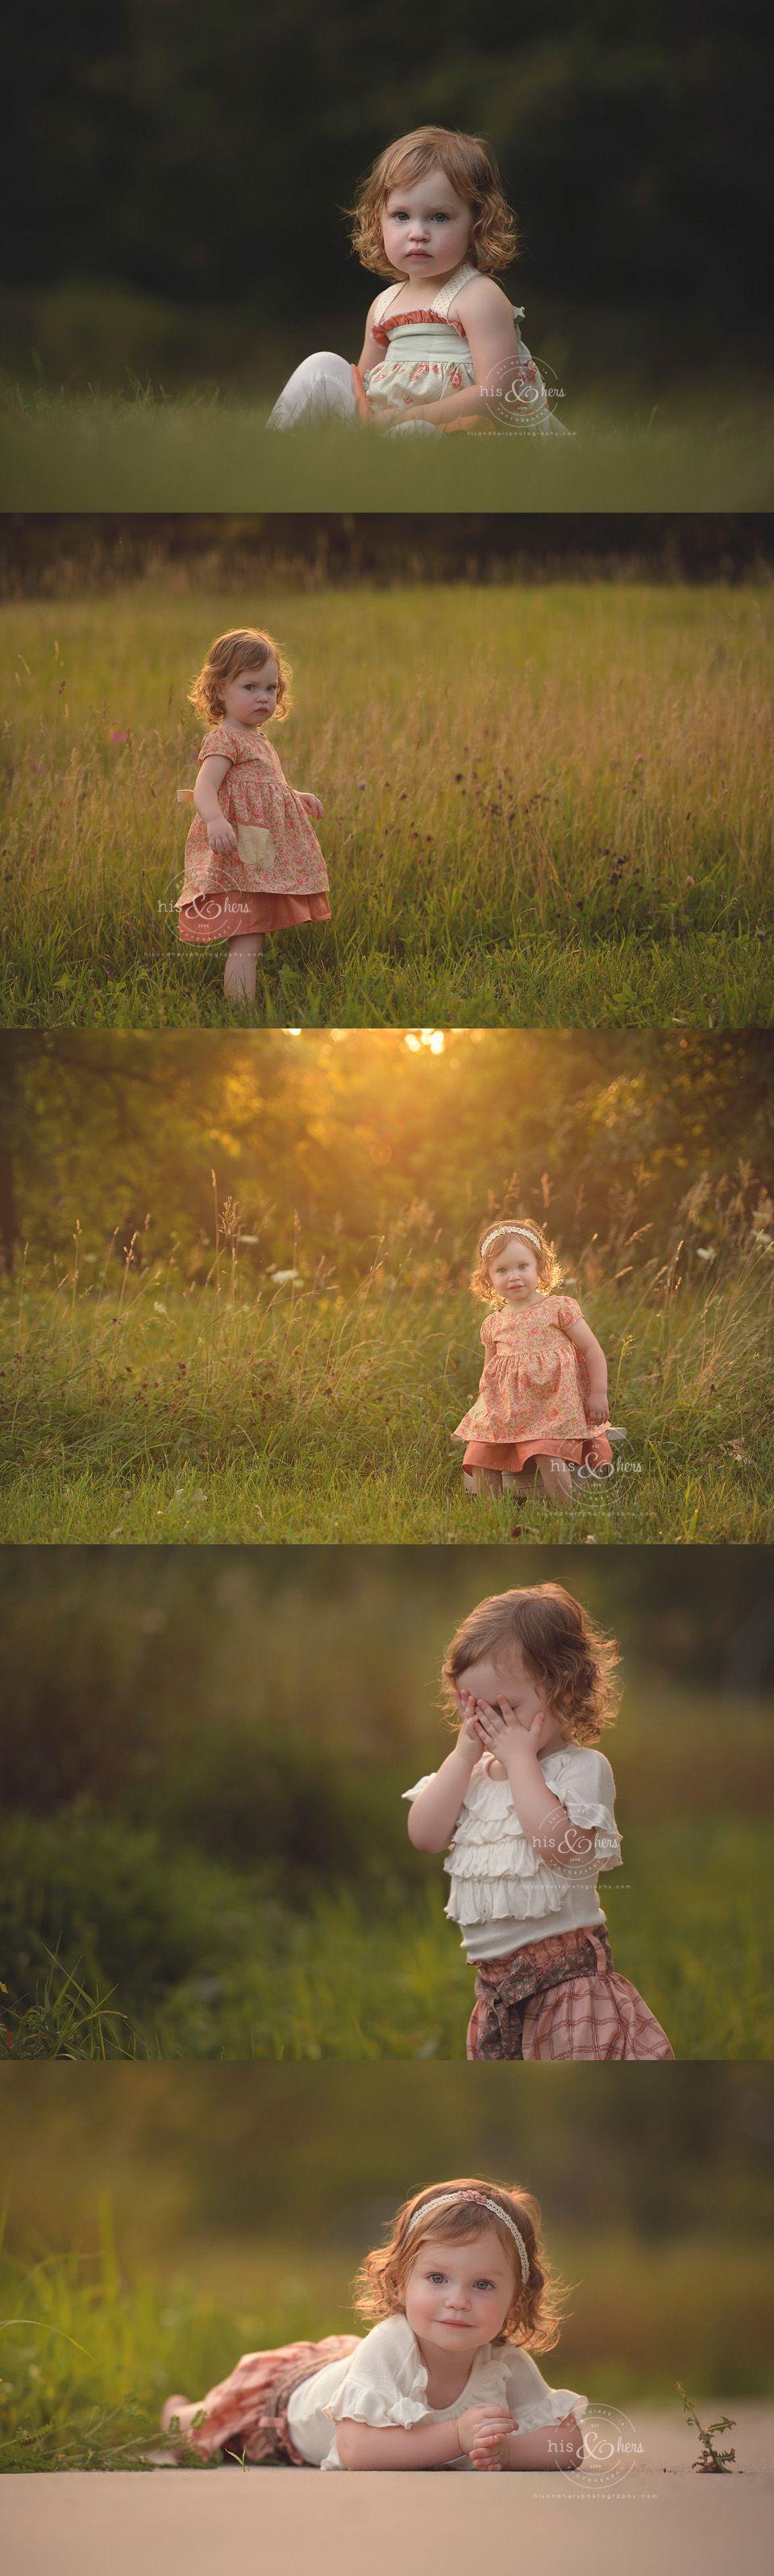 2 year old portraits pictures des moines iowa children's child photographer photography studio